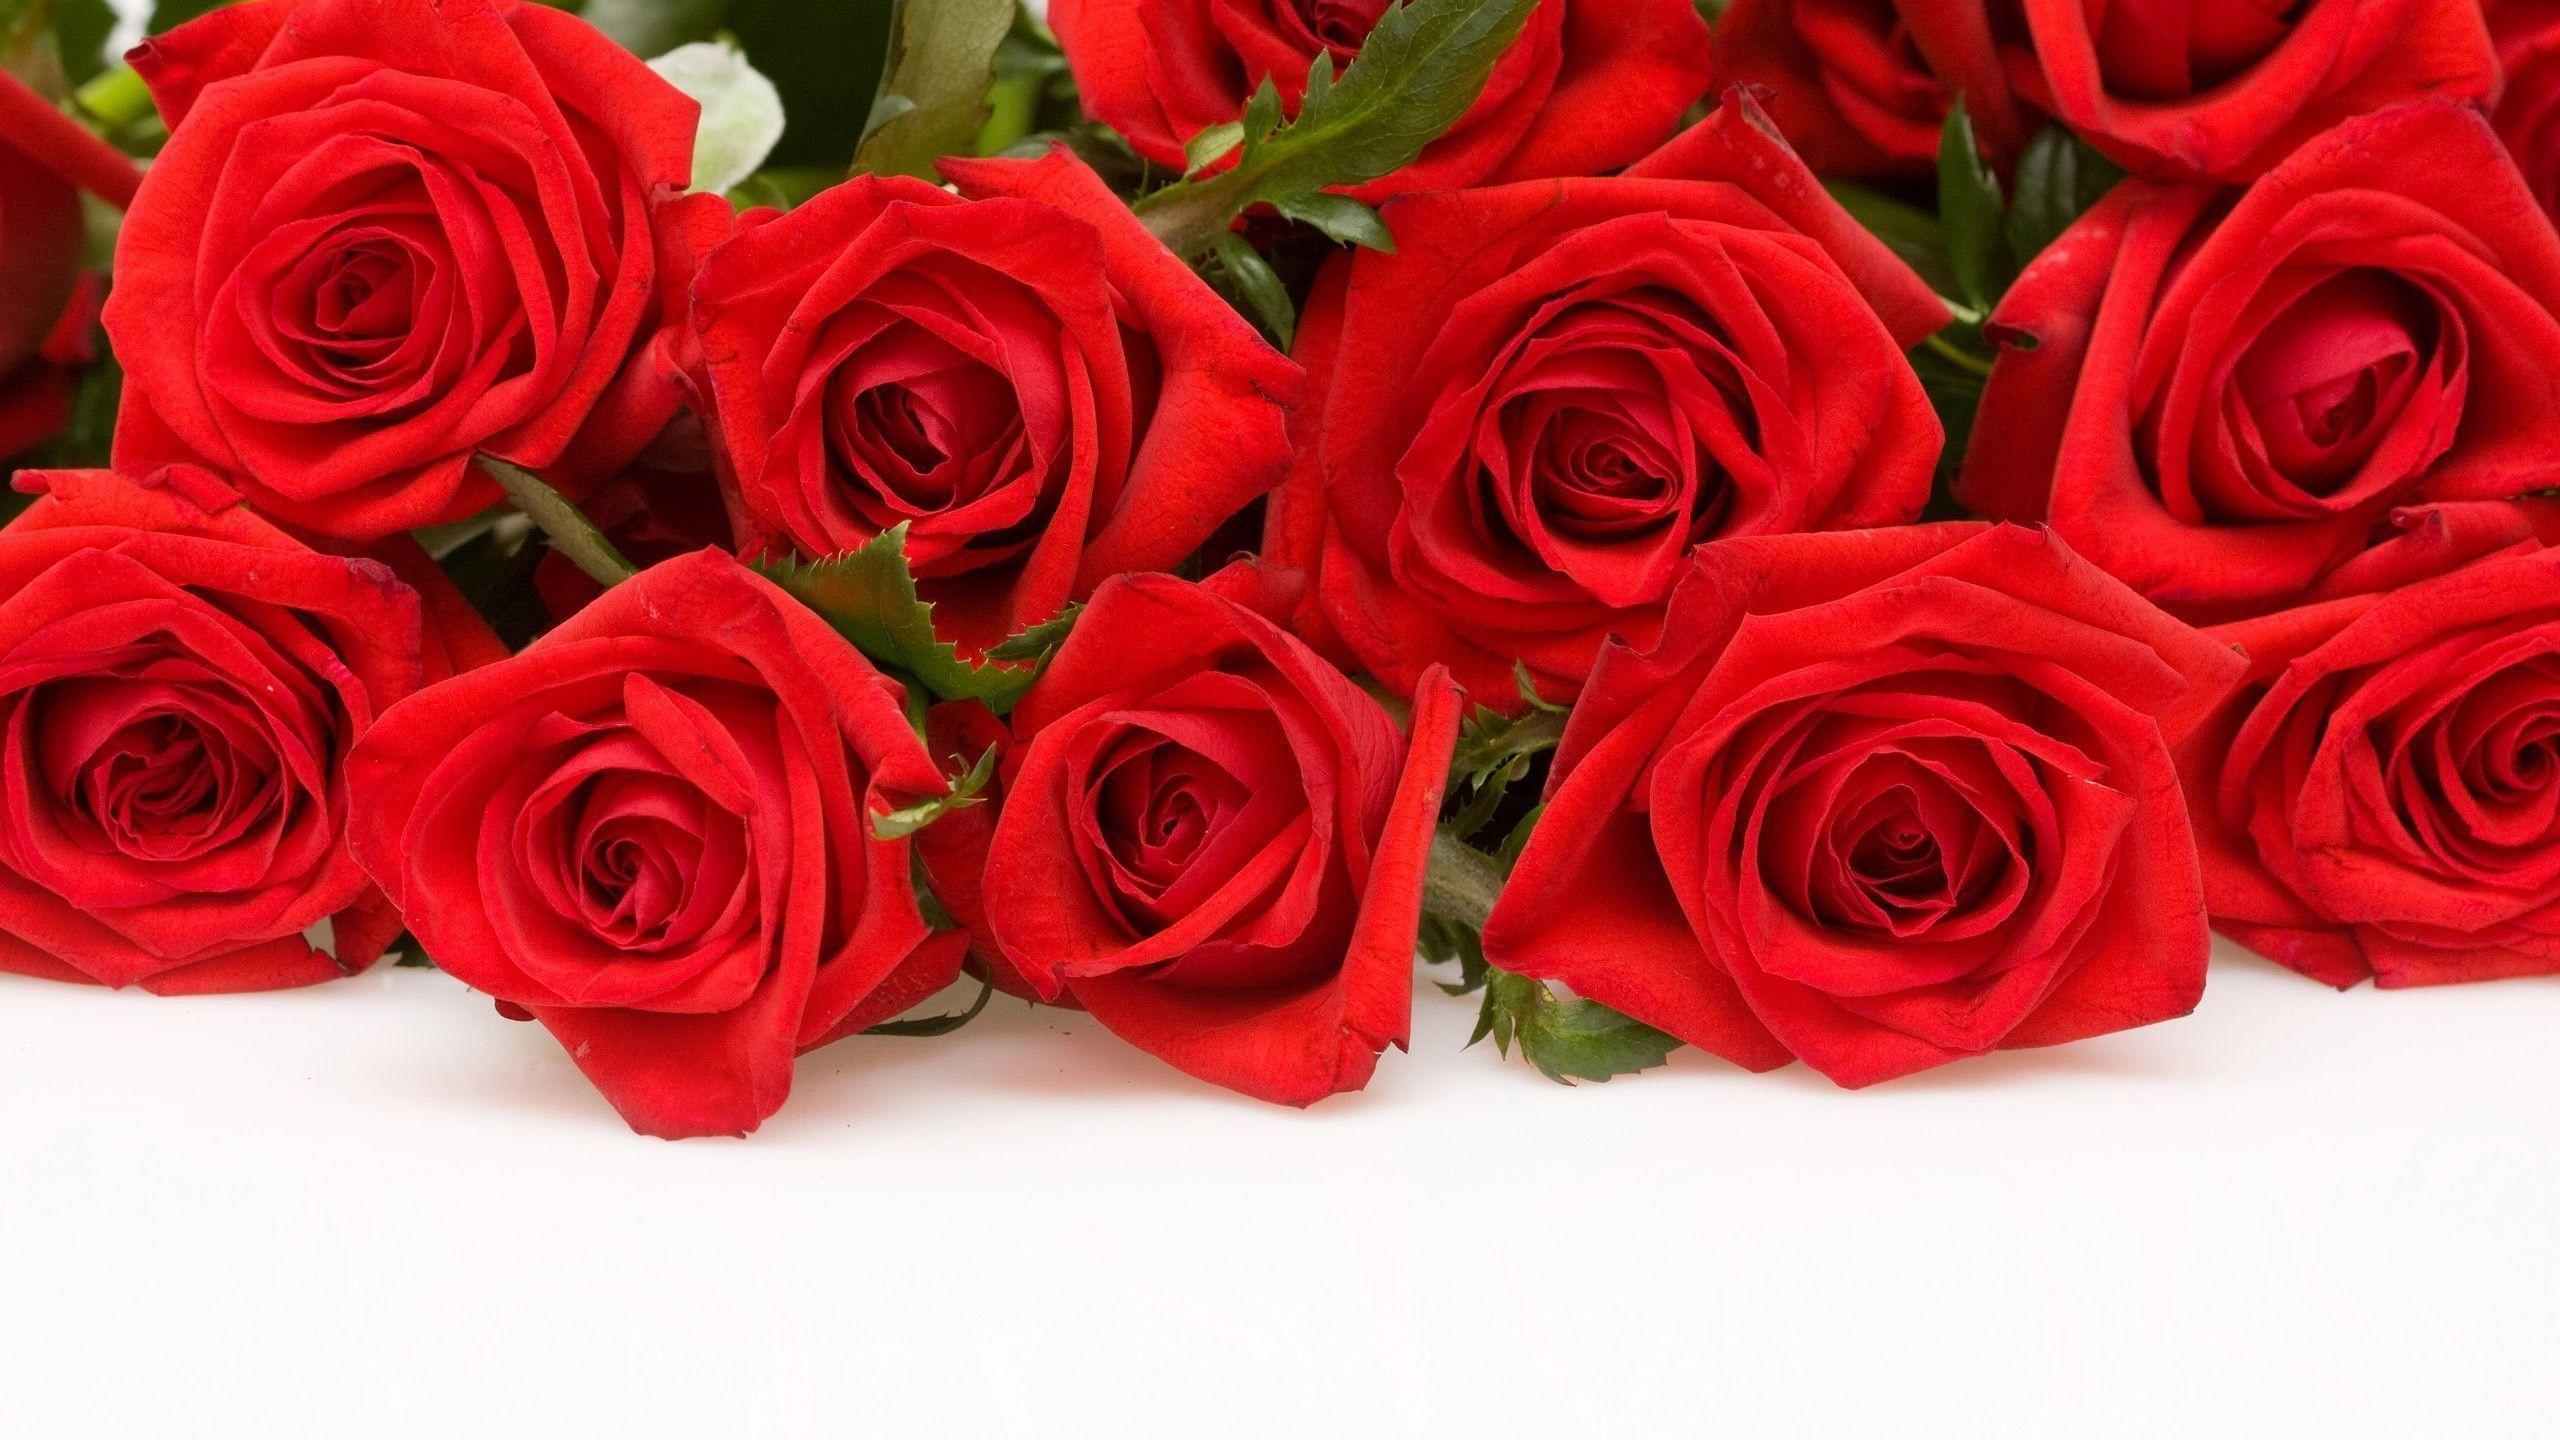 Res: 2560x1440, Wallpapers For > Red Rose Wallpaper Desktop